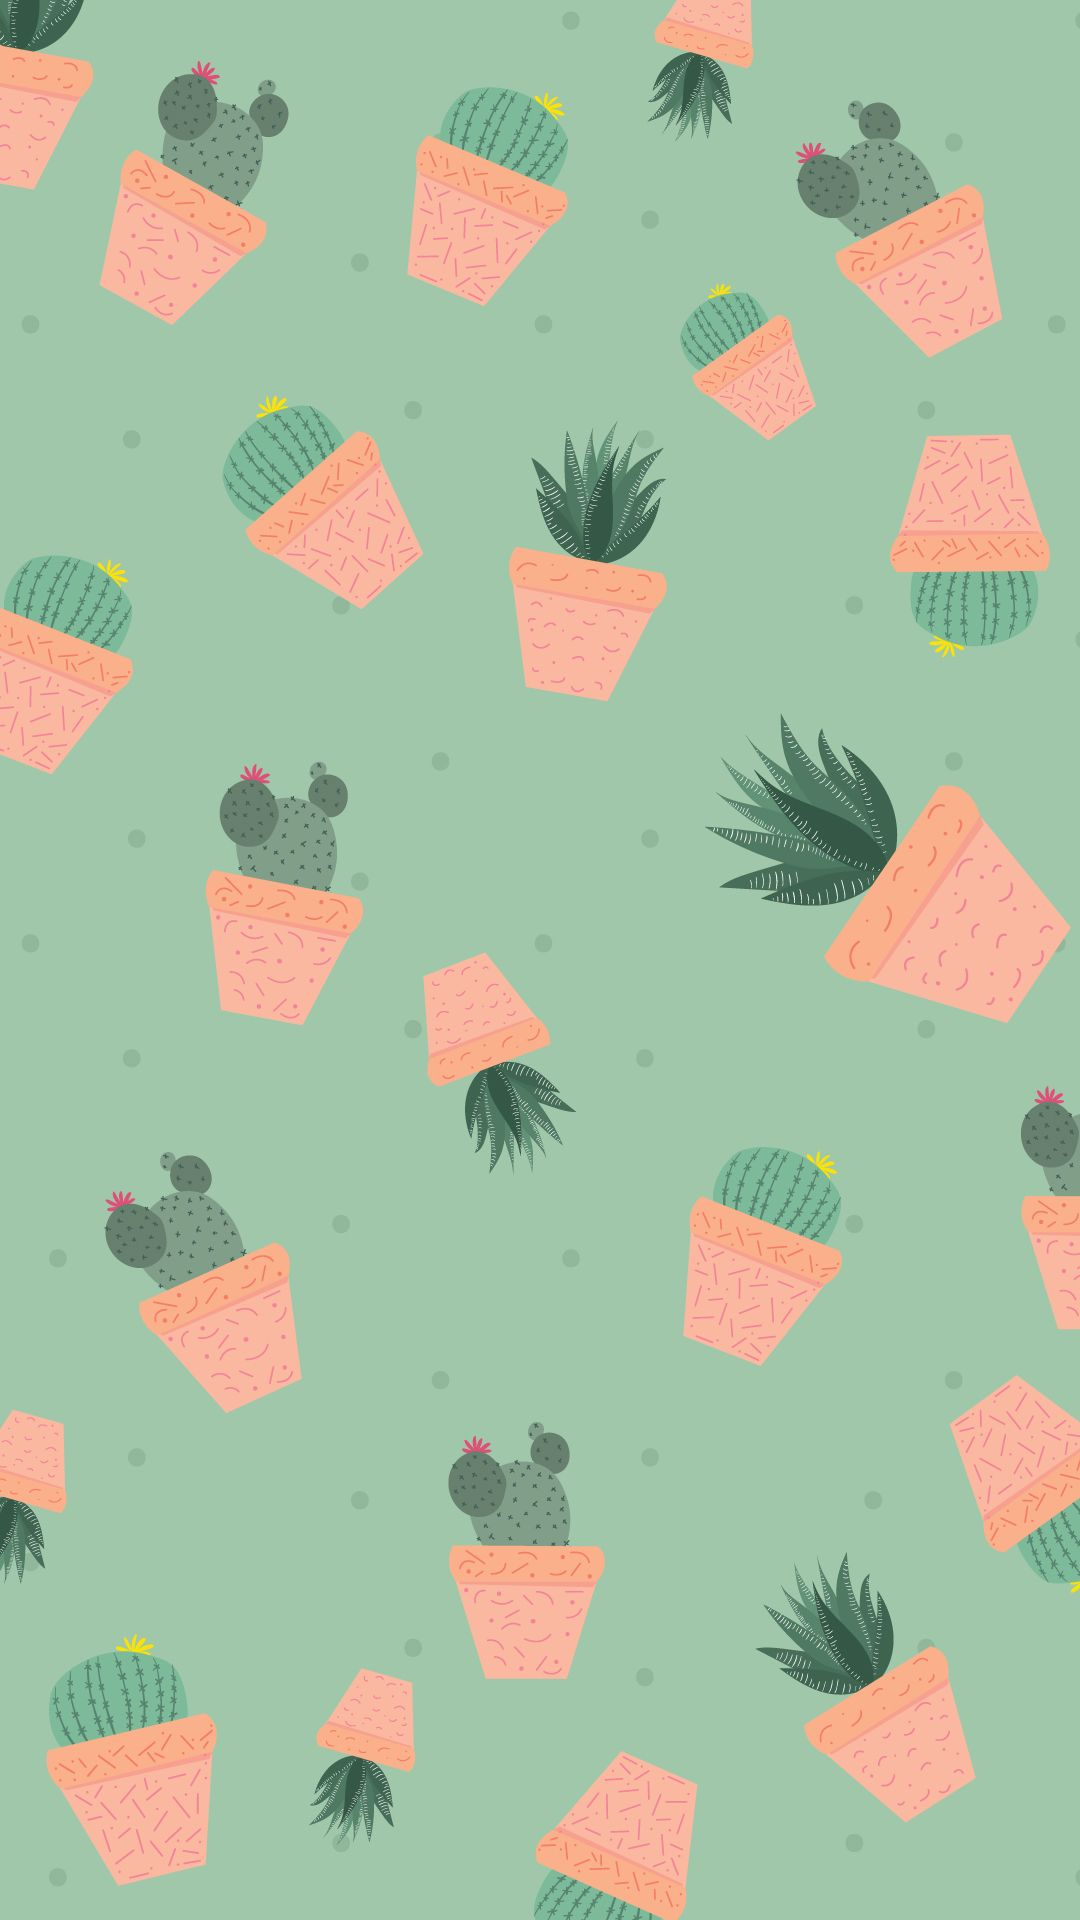 Free Wallpaper Pattern de Suculentas e Cactos